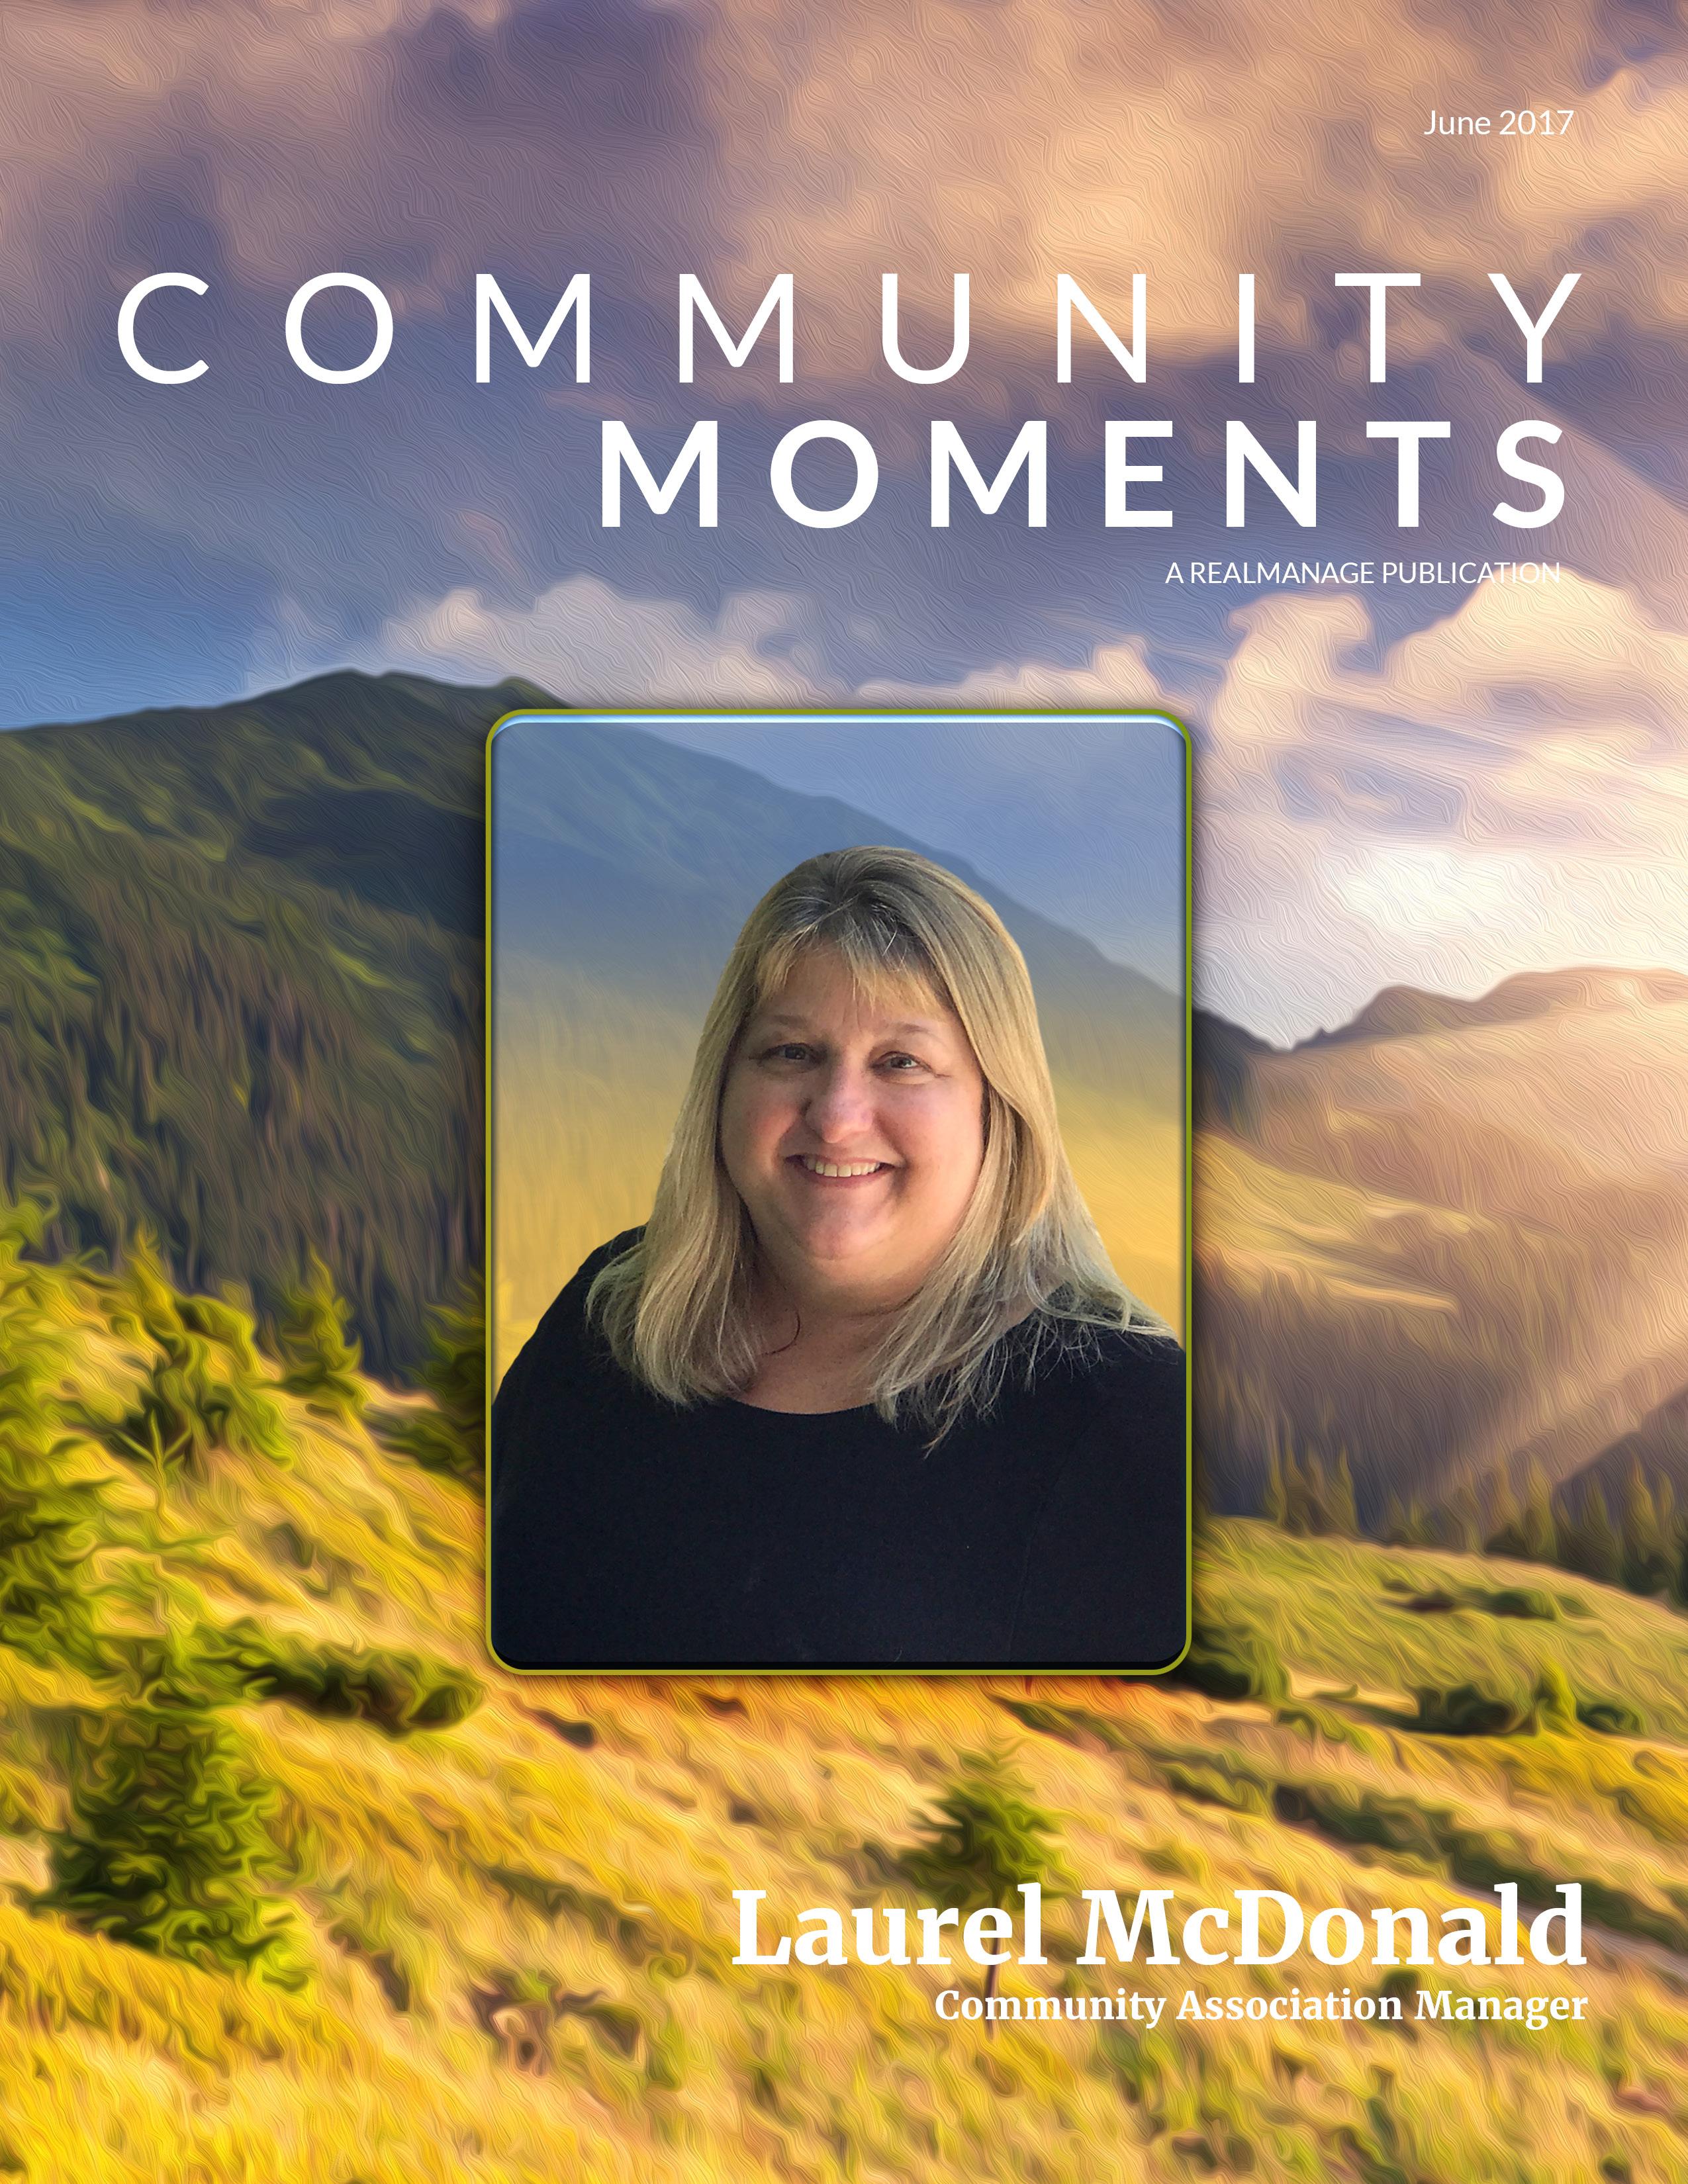 June 2017, Community Moments Magazine Cover